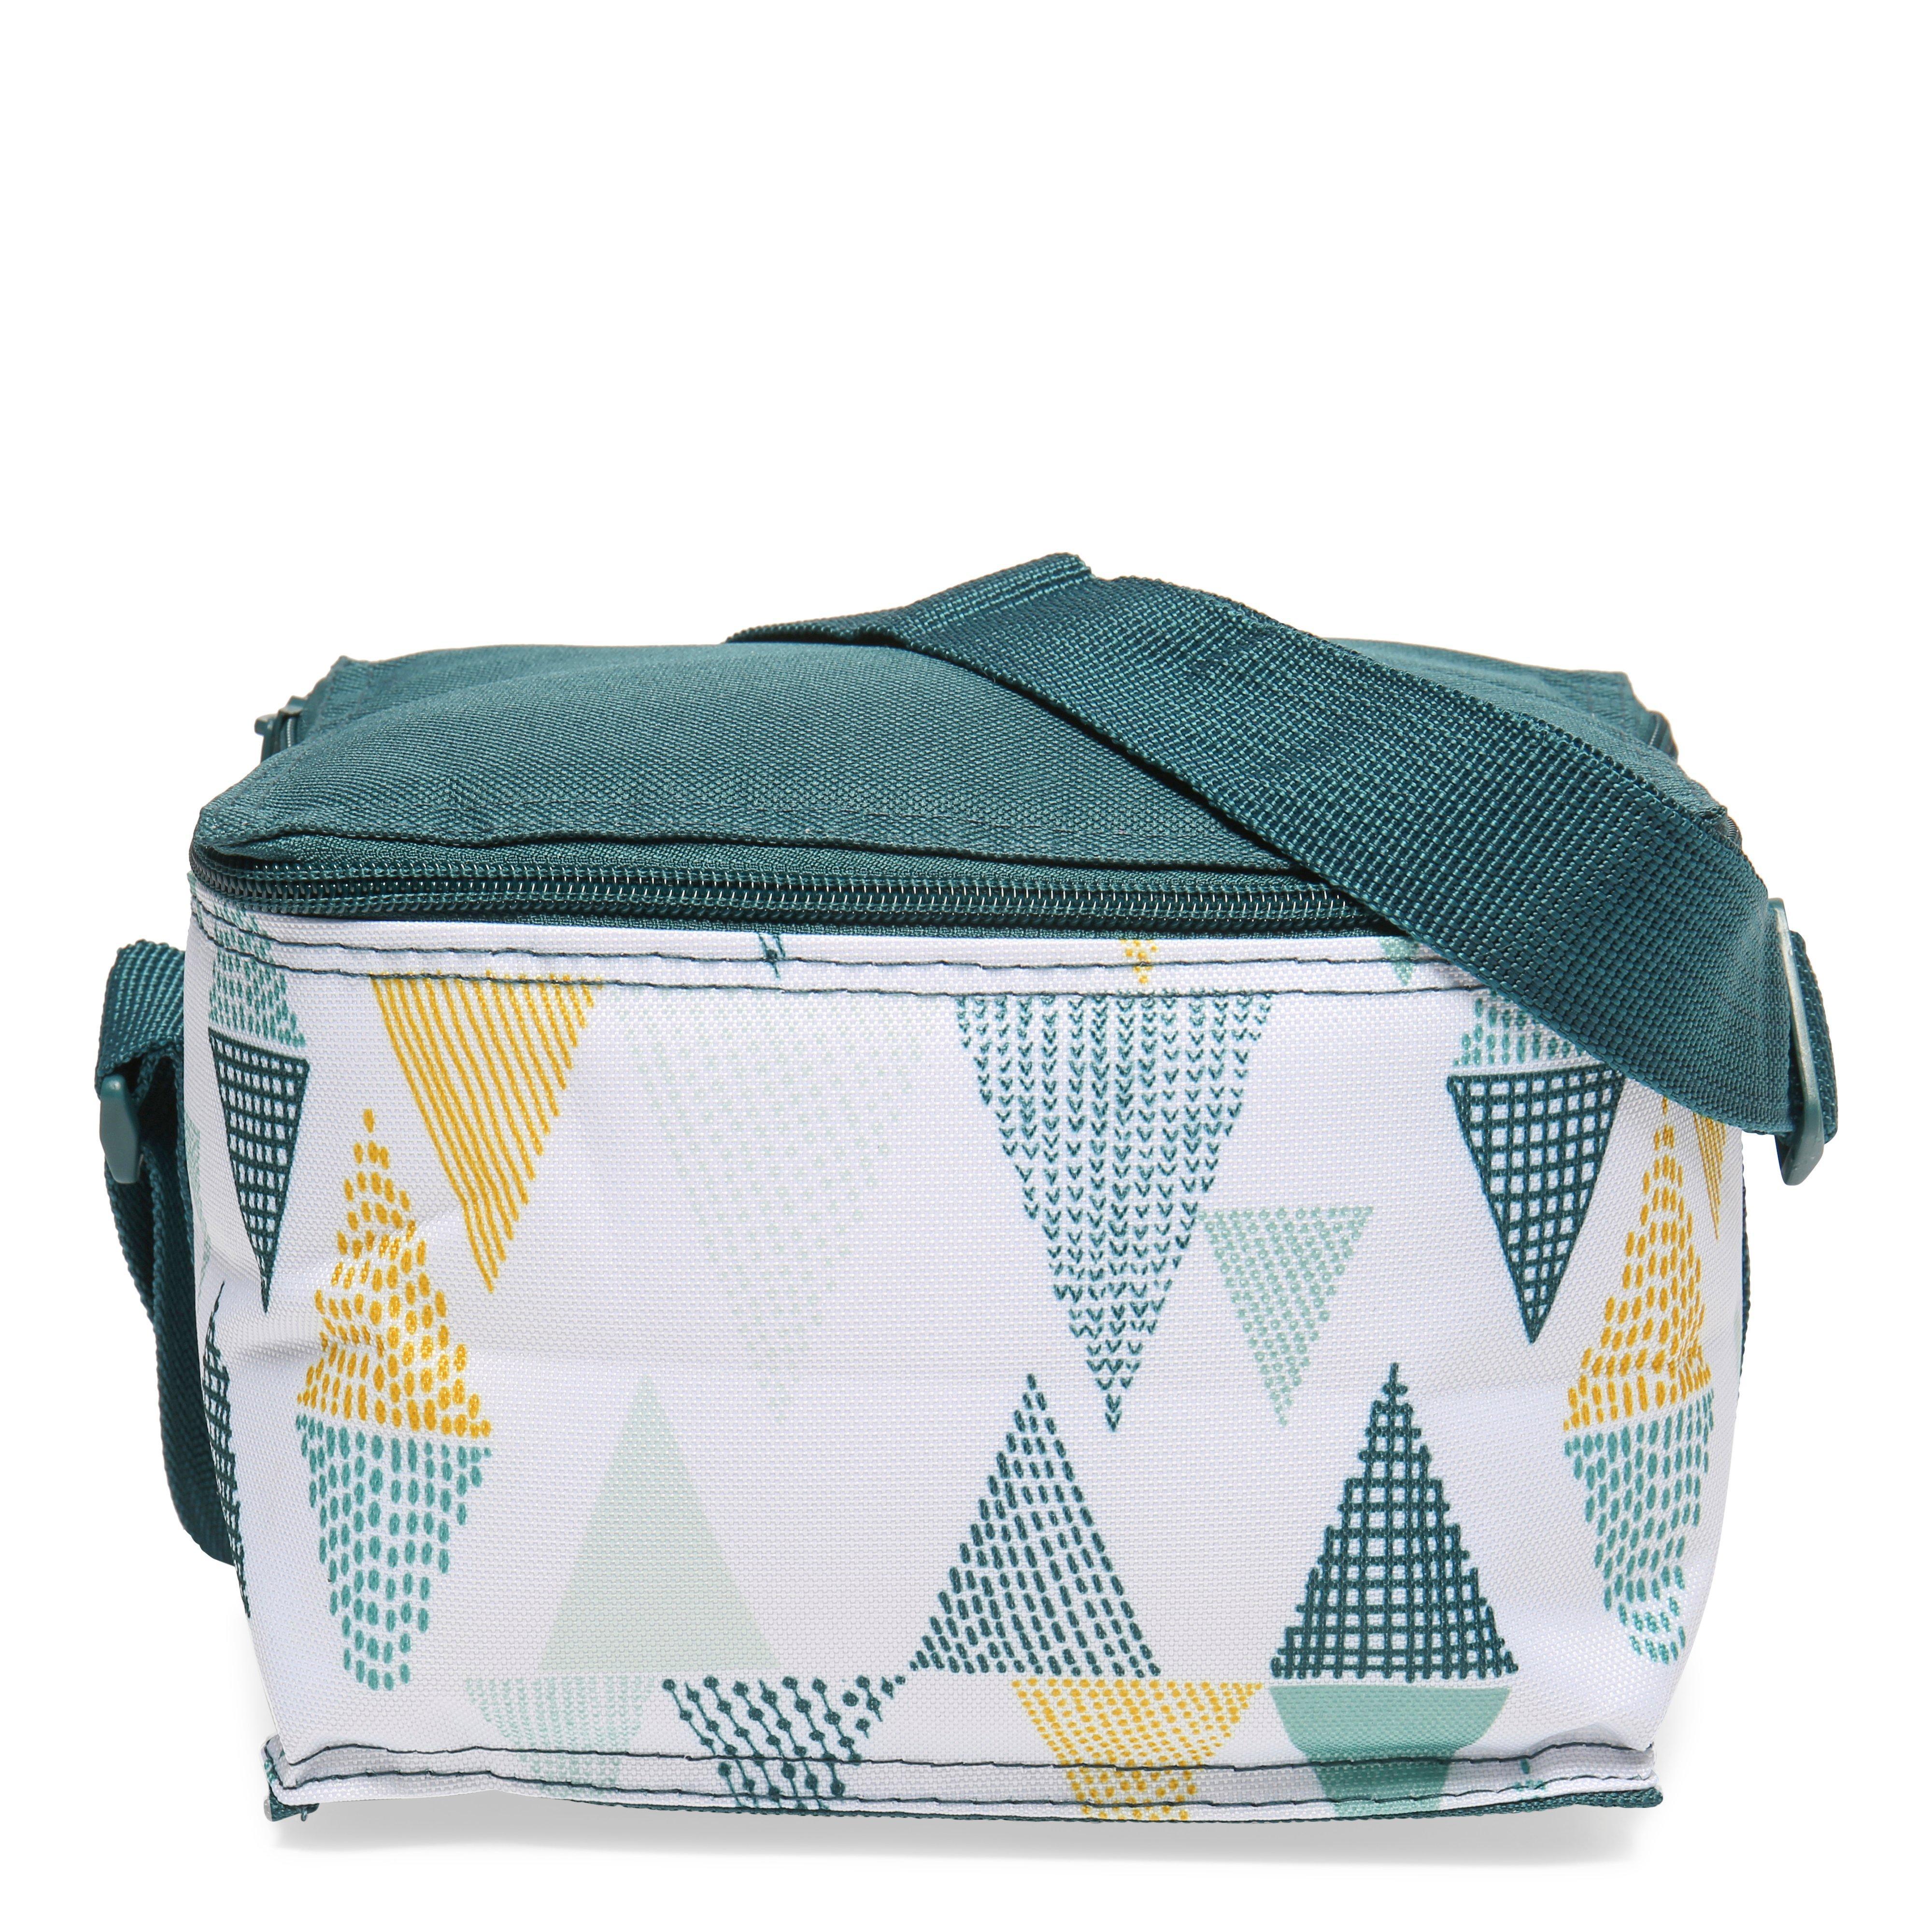 Eurohike Cooler Bag, Multi